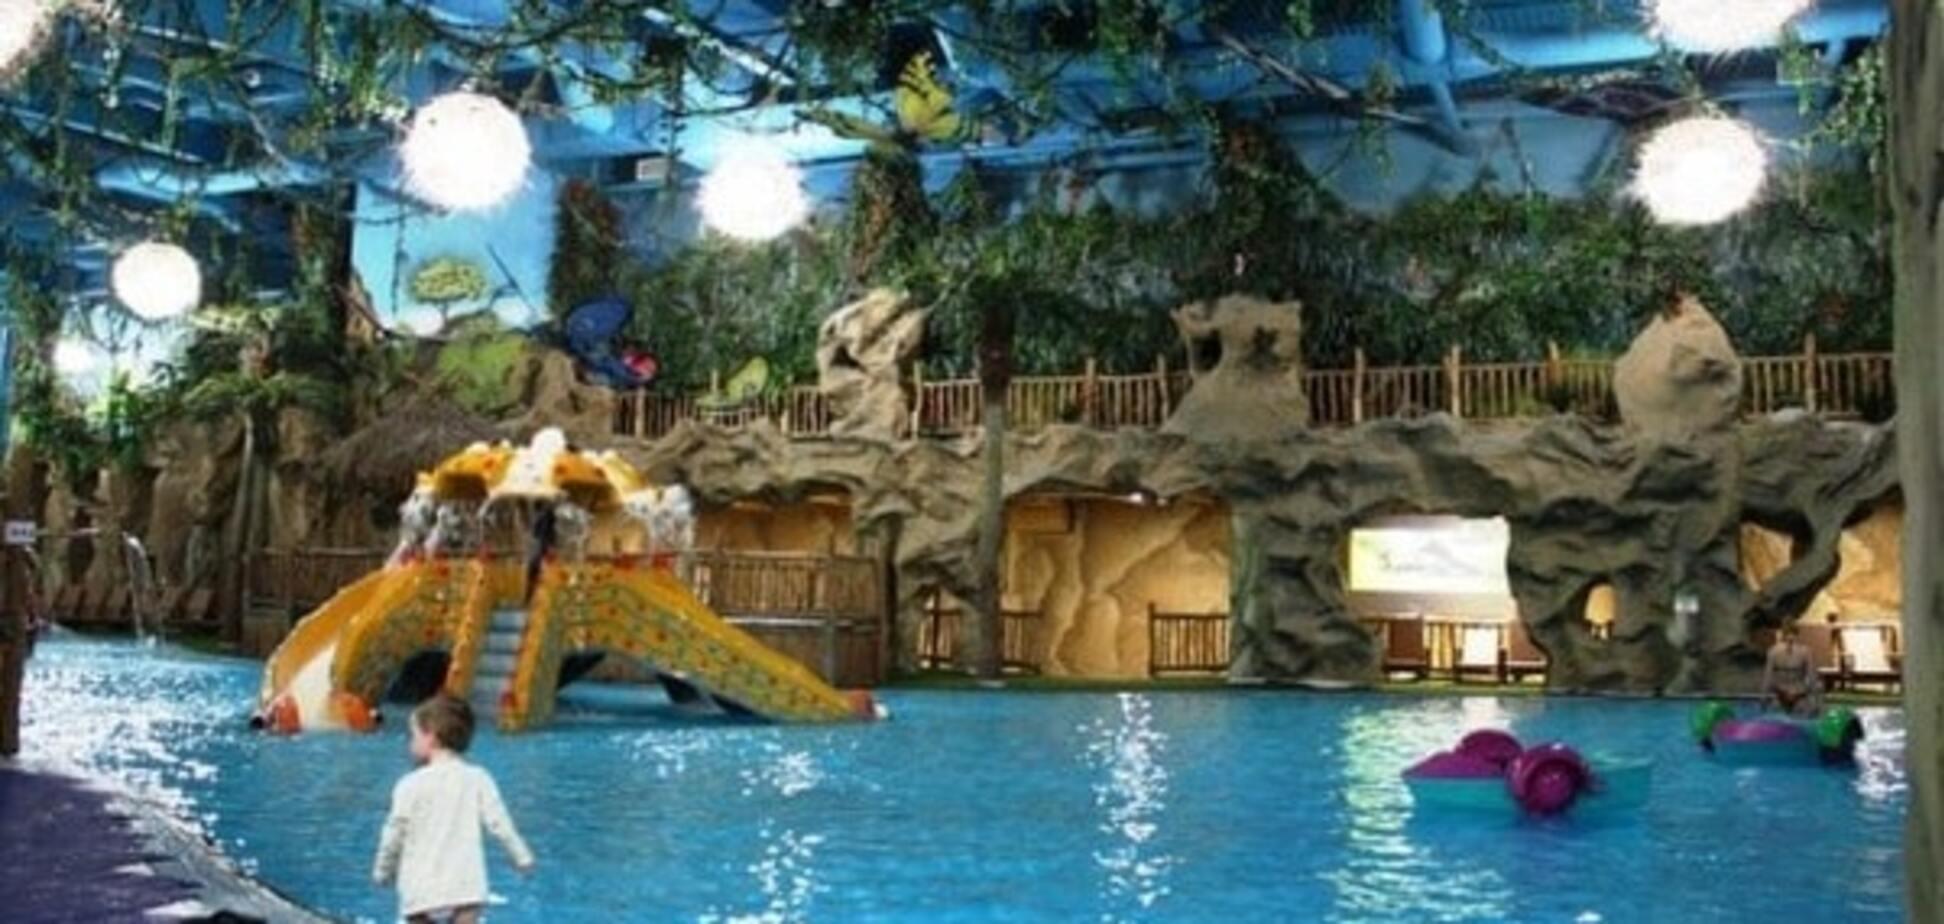 Київський аквапарк, де потонув хлопчик, хвалився рятувальниками-профі